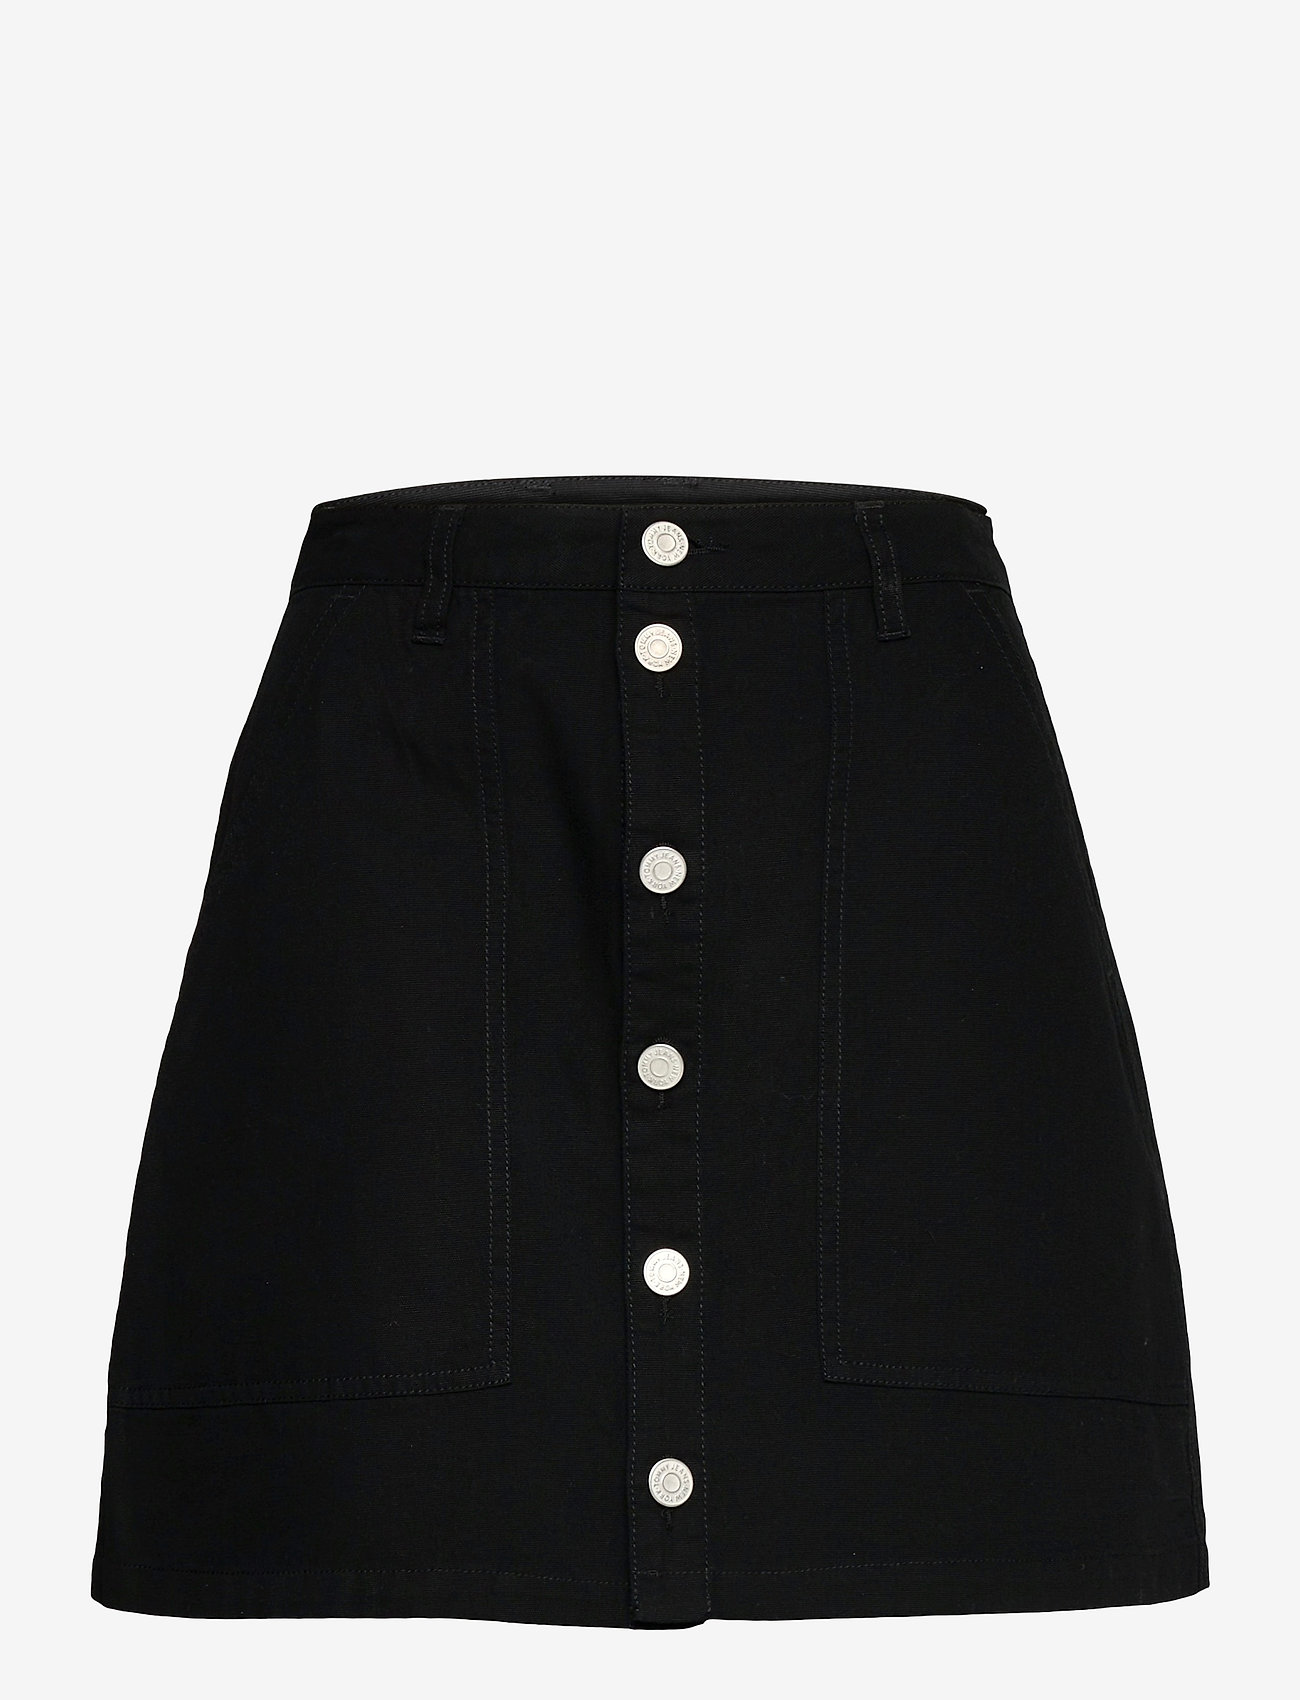 Tommy Jeans - TJW BADGE BUTTON THROUGH SKIRT - midi skirts - black - 0